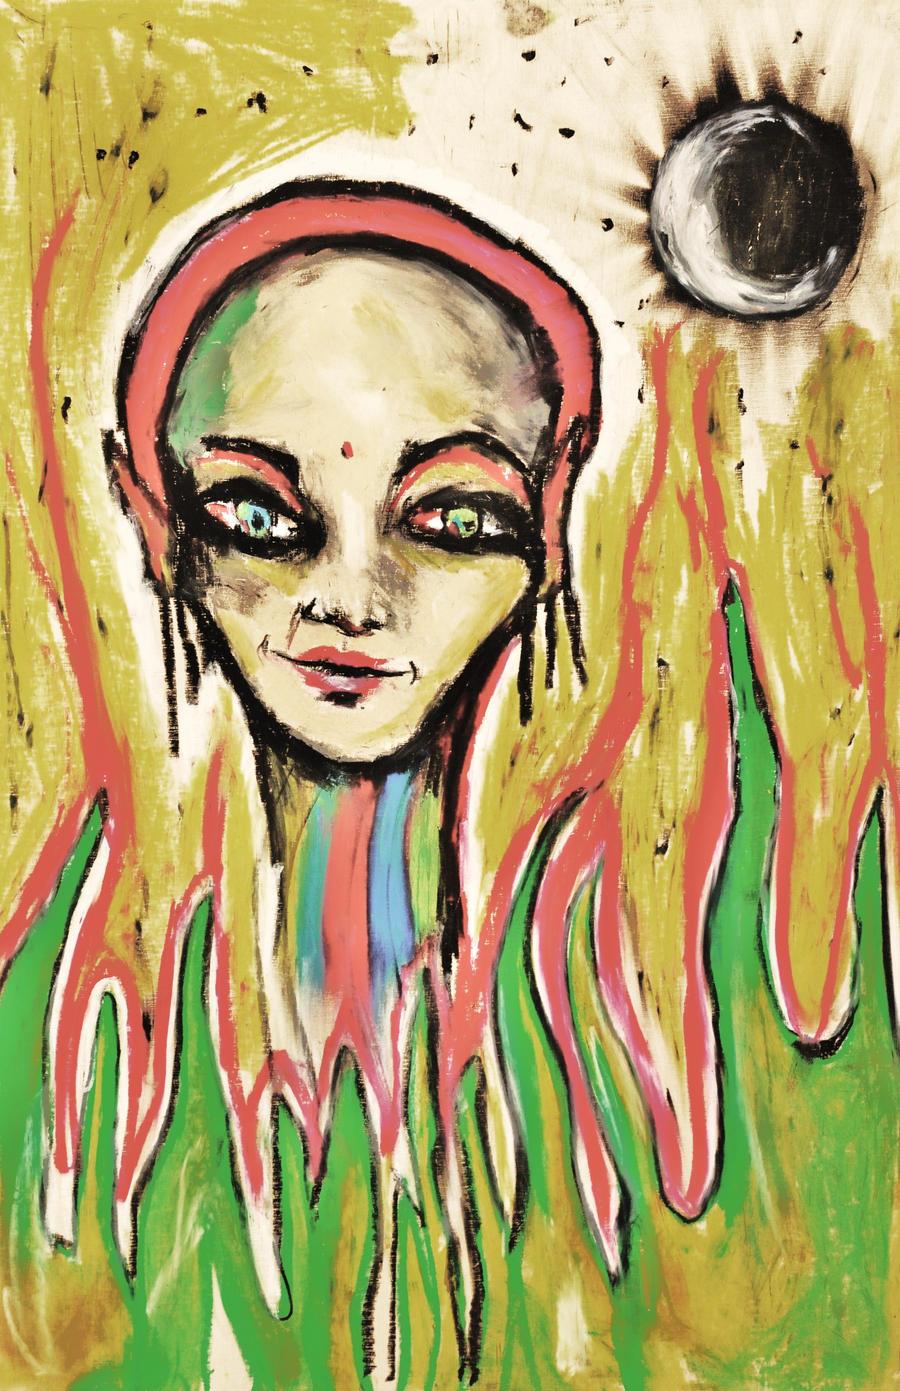 Other World by StrangerLyri